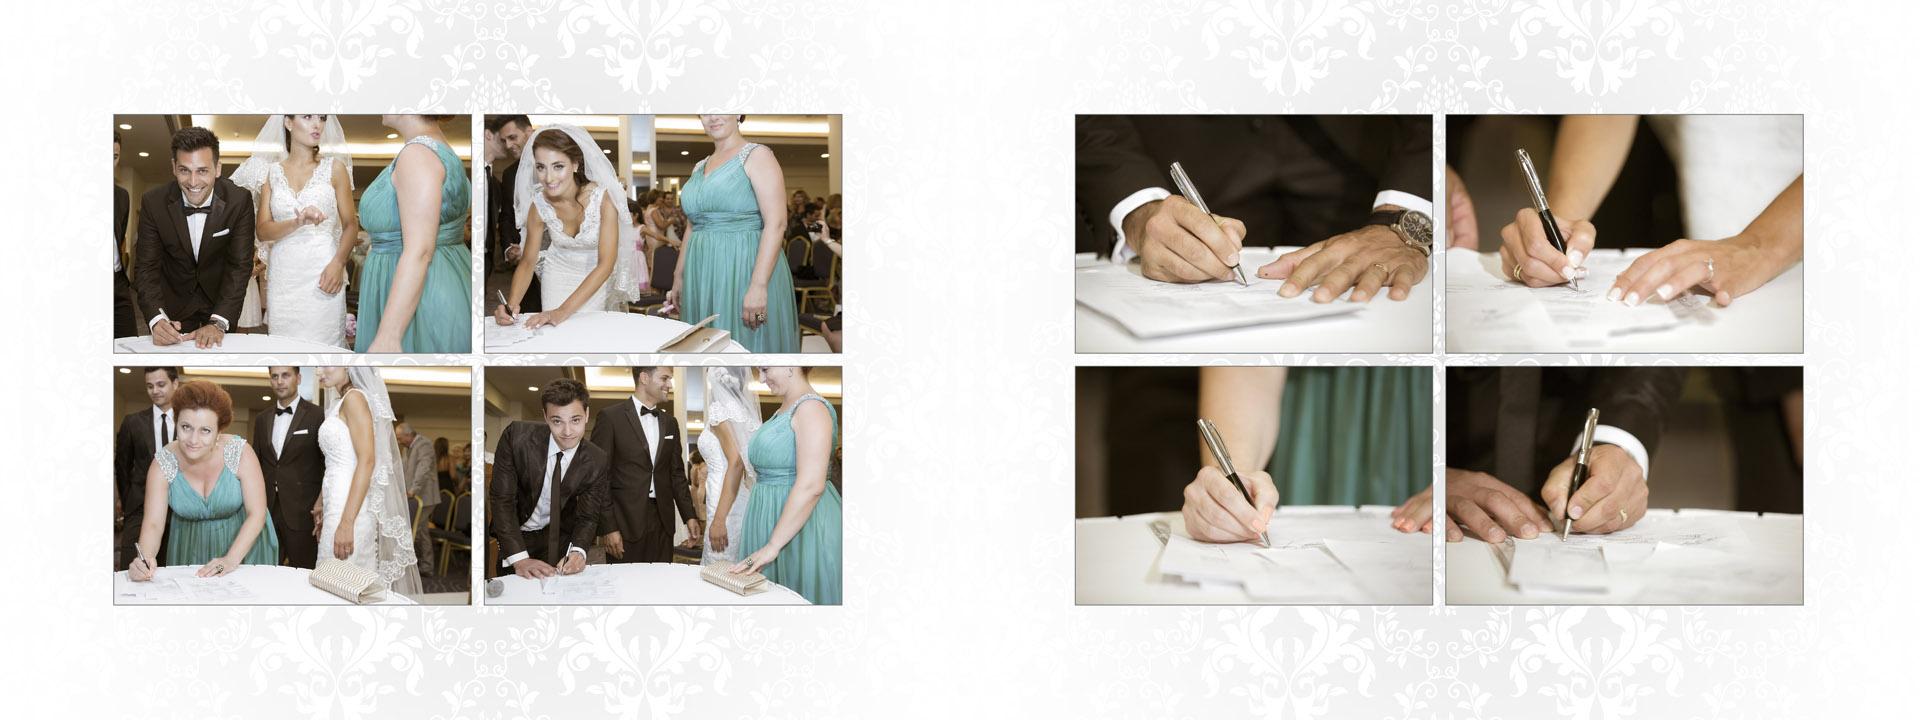 Anna & Loris Wedding Studio 74 Photography